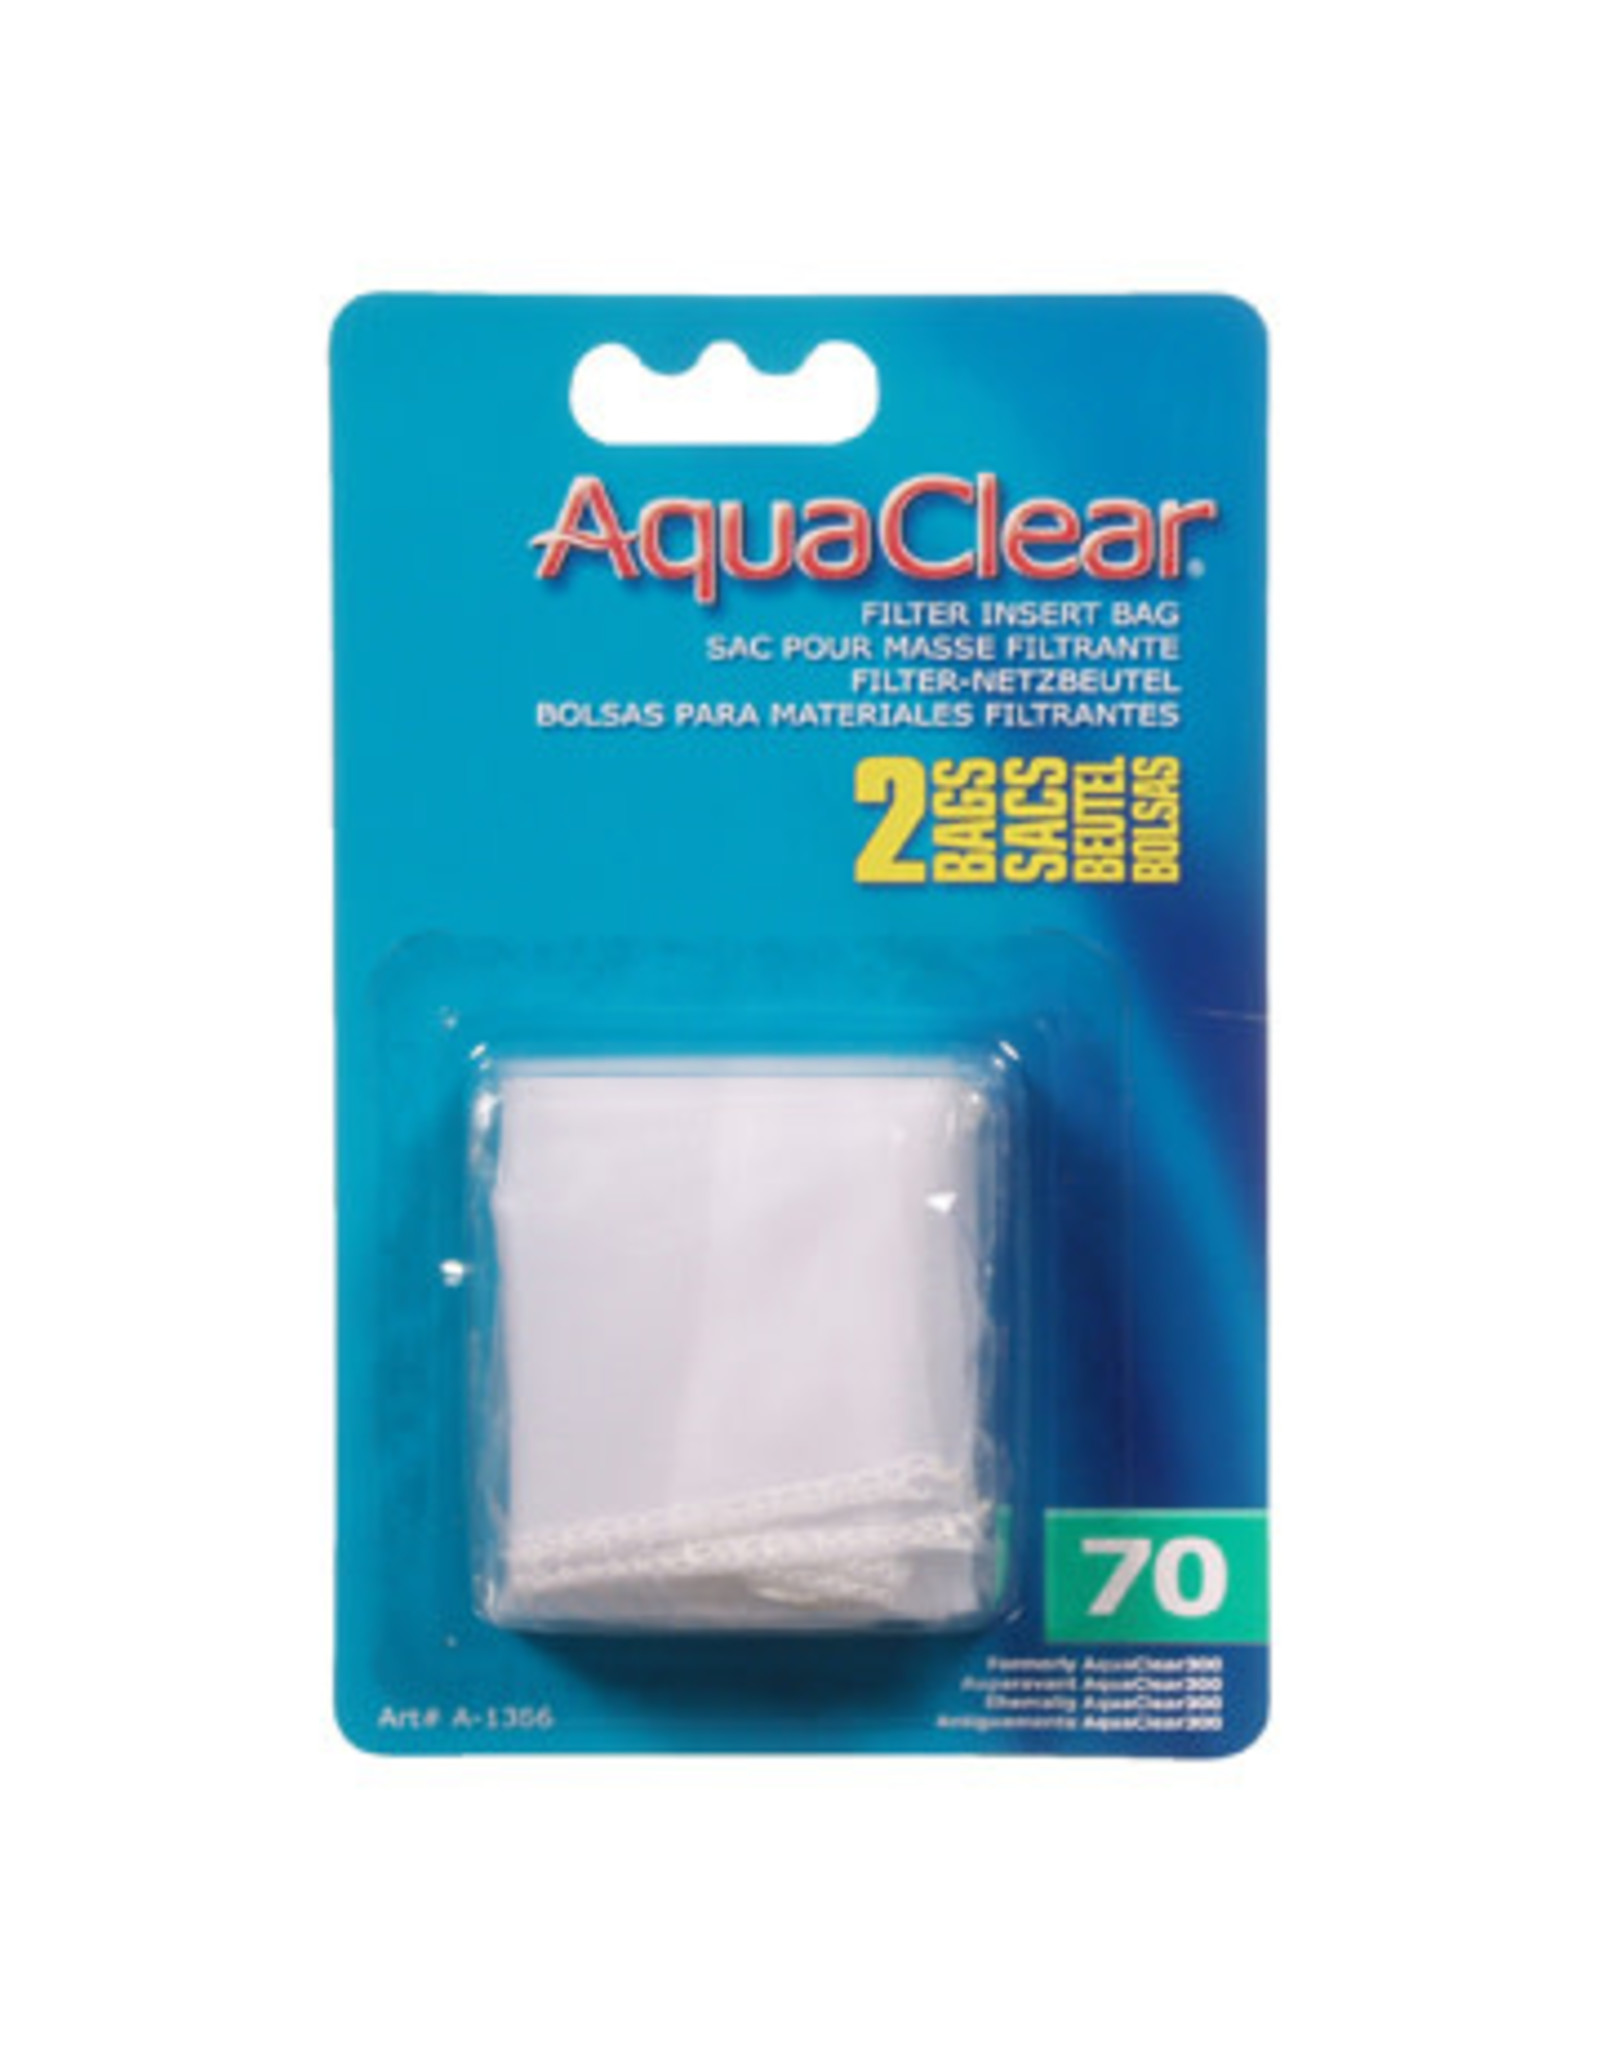 AquaClear Nylon Filter Media Bags for AquaClear 70 - 2 Pack